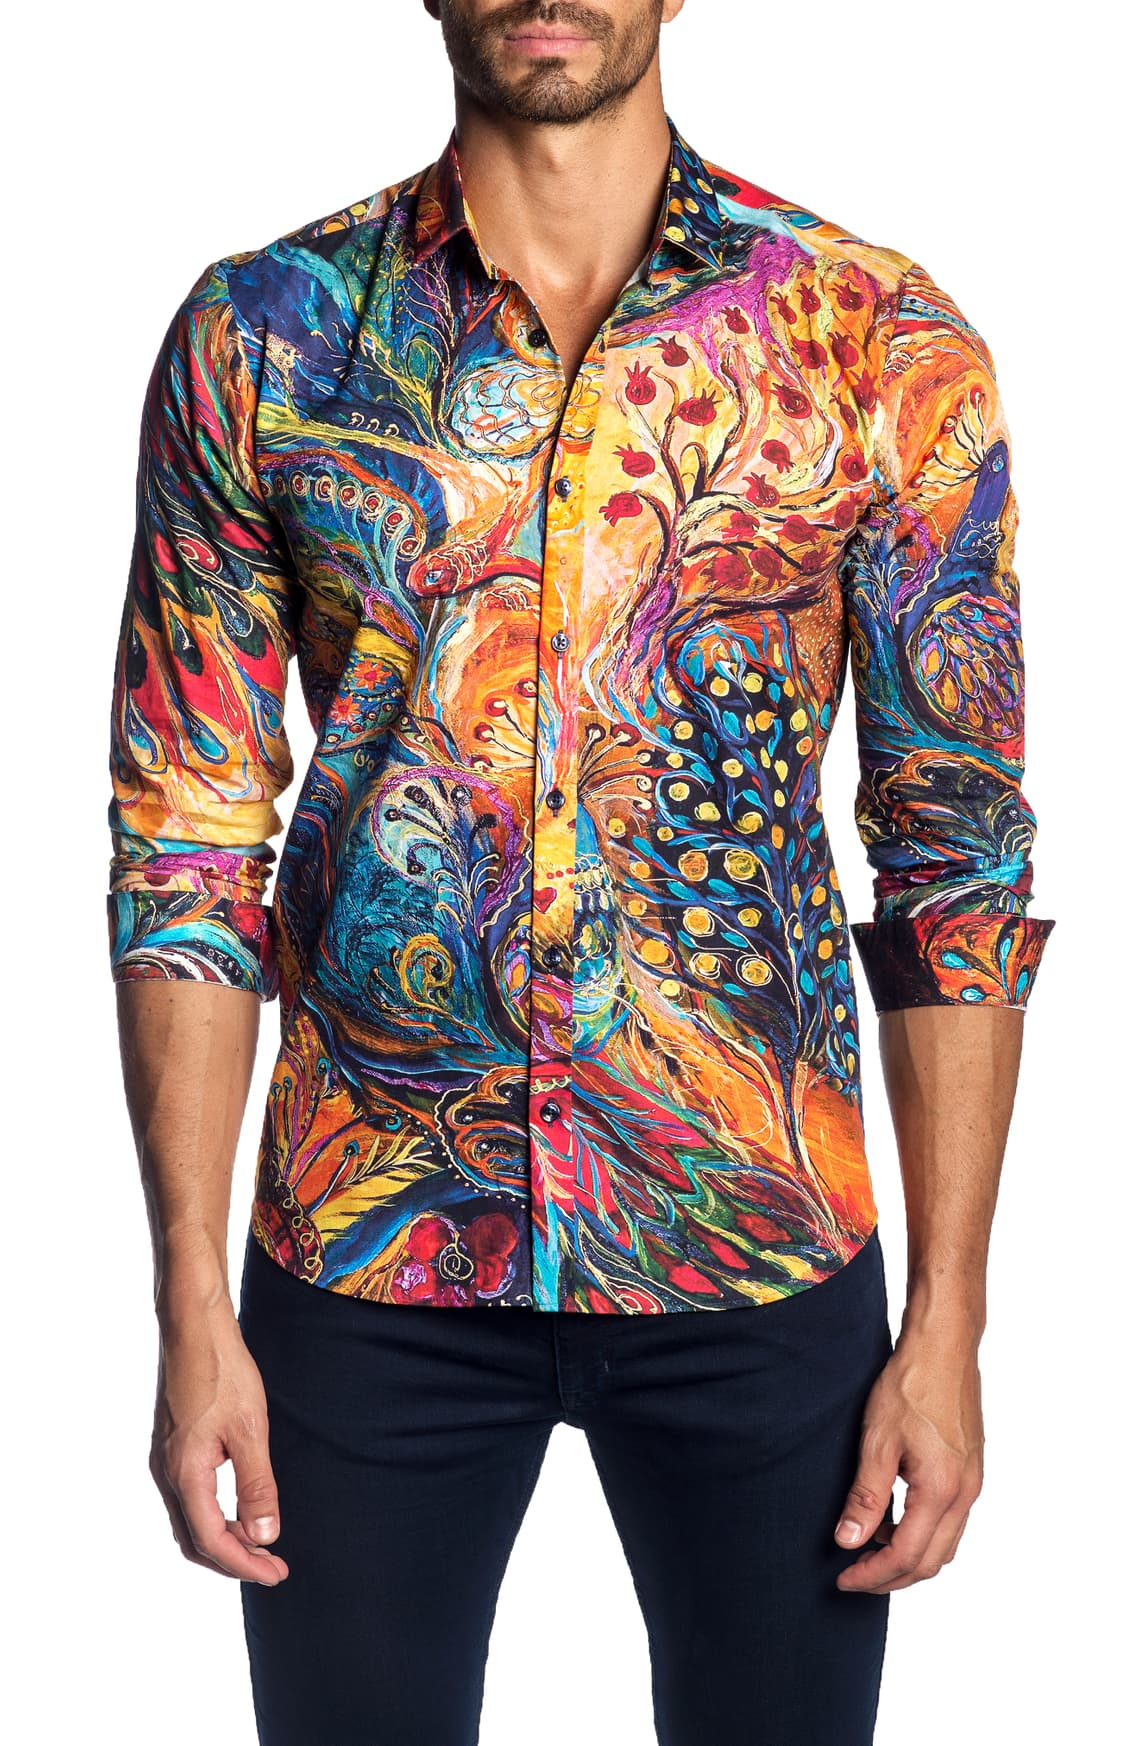 Good Quality 3d-print Hip Hop Dress Shirts Men 2019 New Chemise Homme Manche Longue Colorful Print Mens Shirts Casual Slim Fit